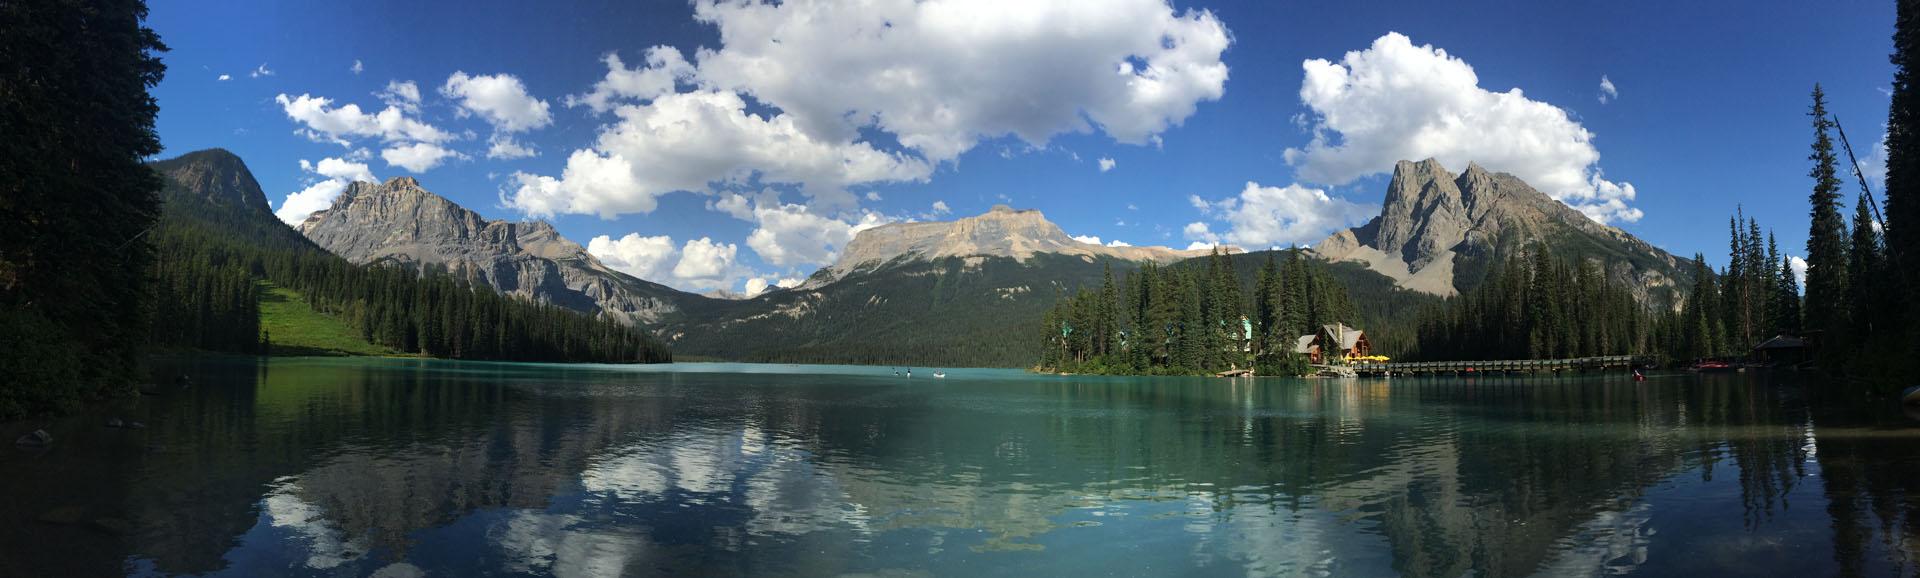 Crossing Canada – B.C. und Alberta